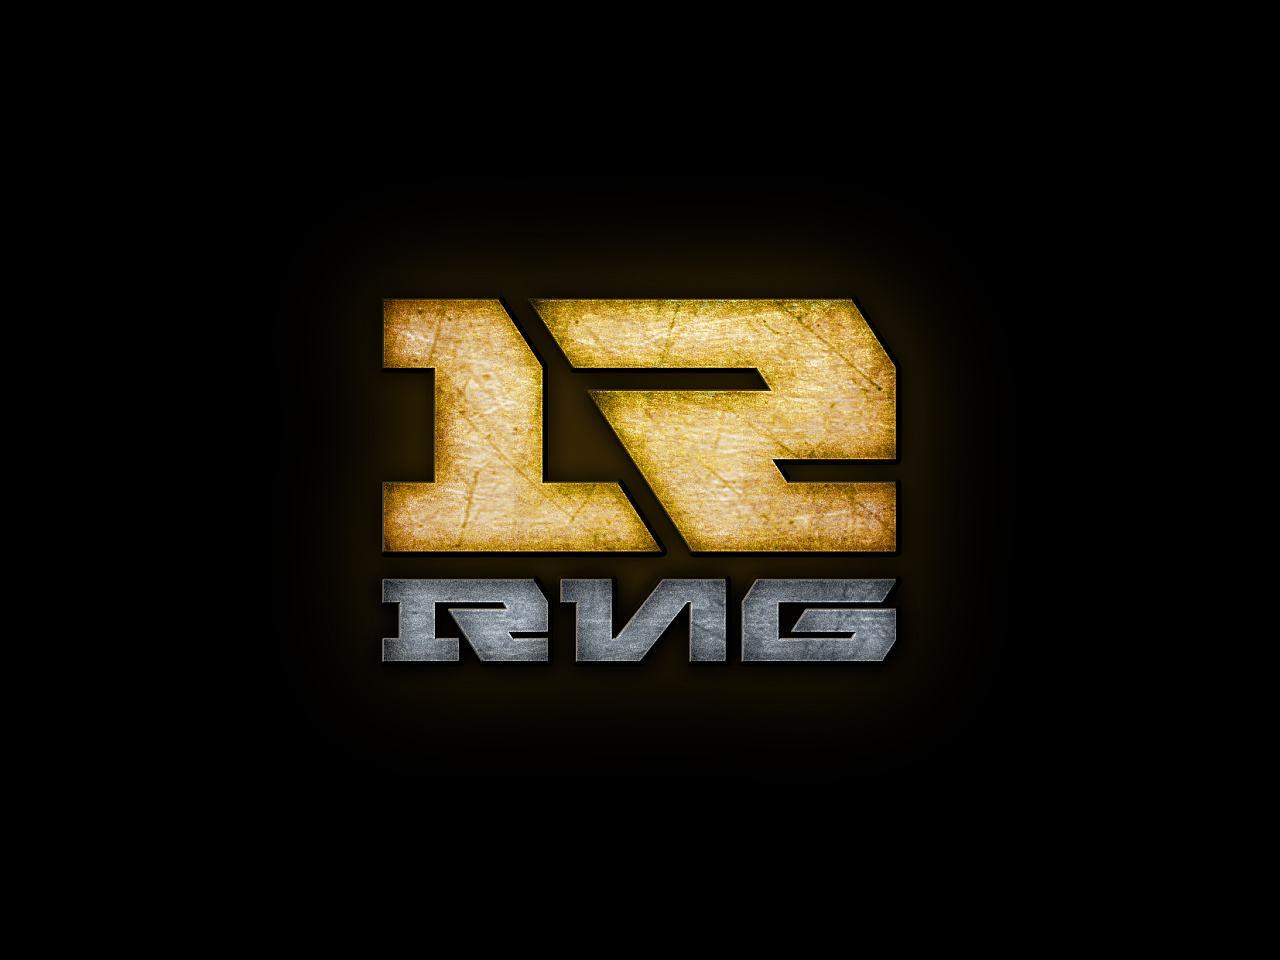 英雄联盟RoyalNeverGiveUp战队——RNG